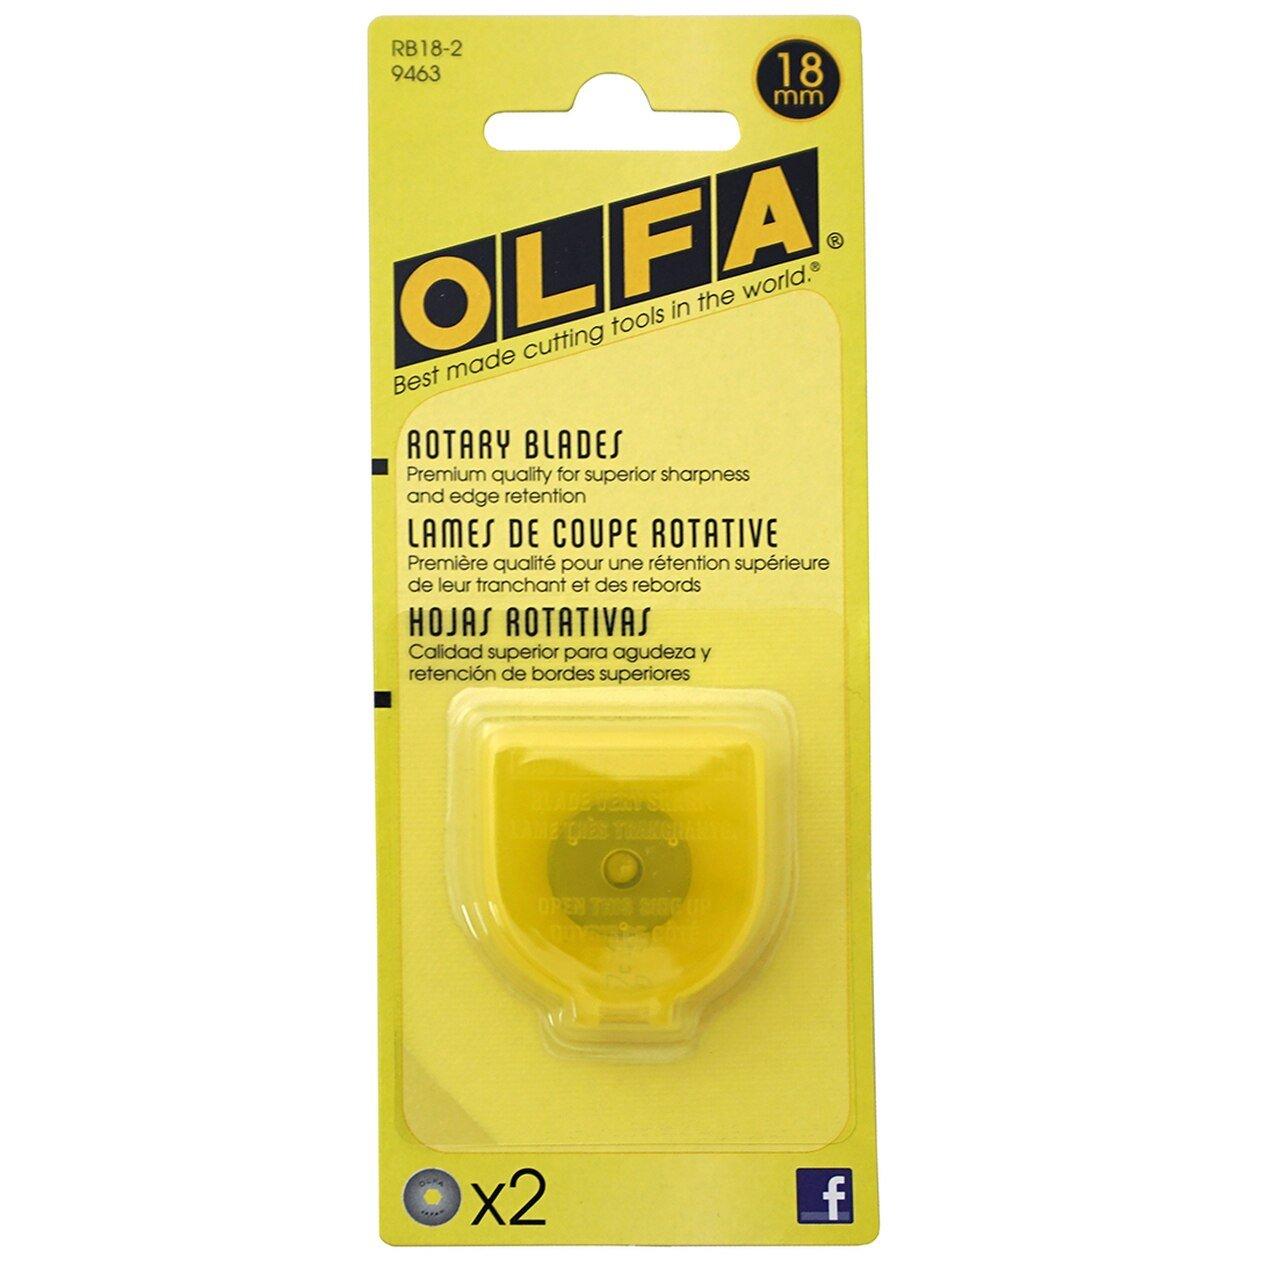 OLFA Rotary Blades